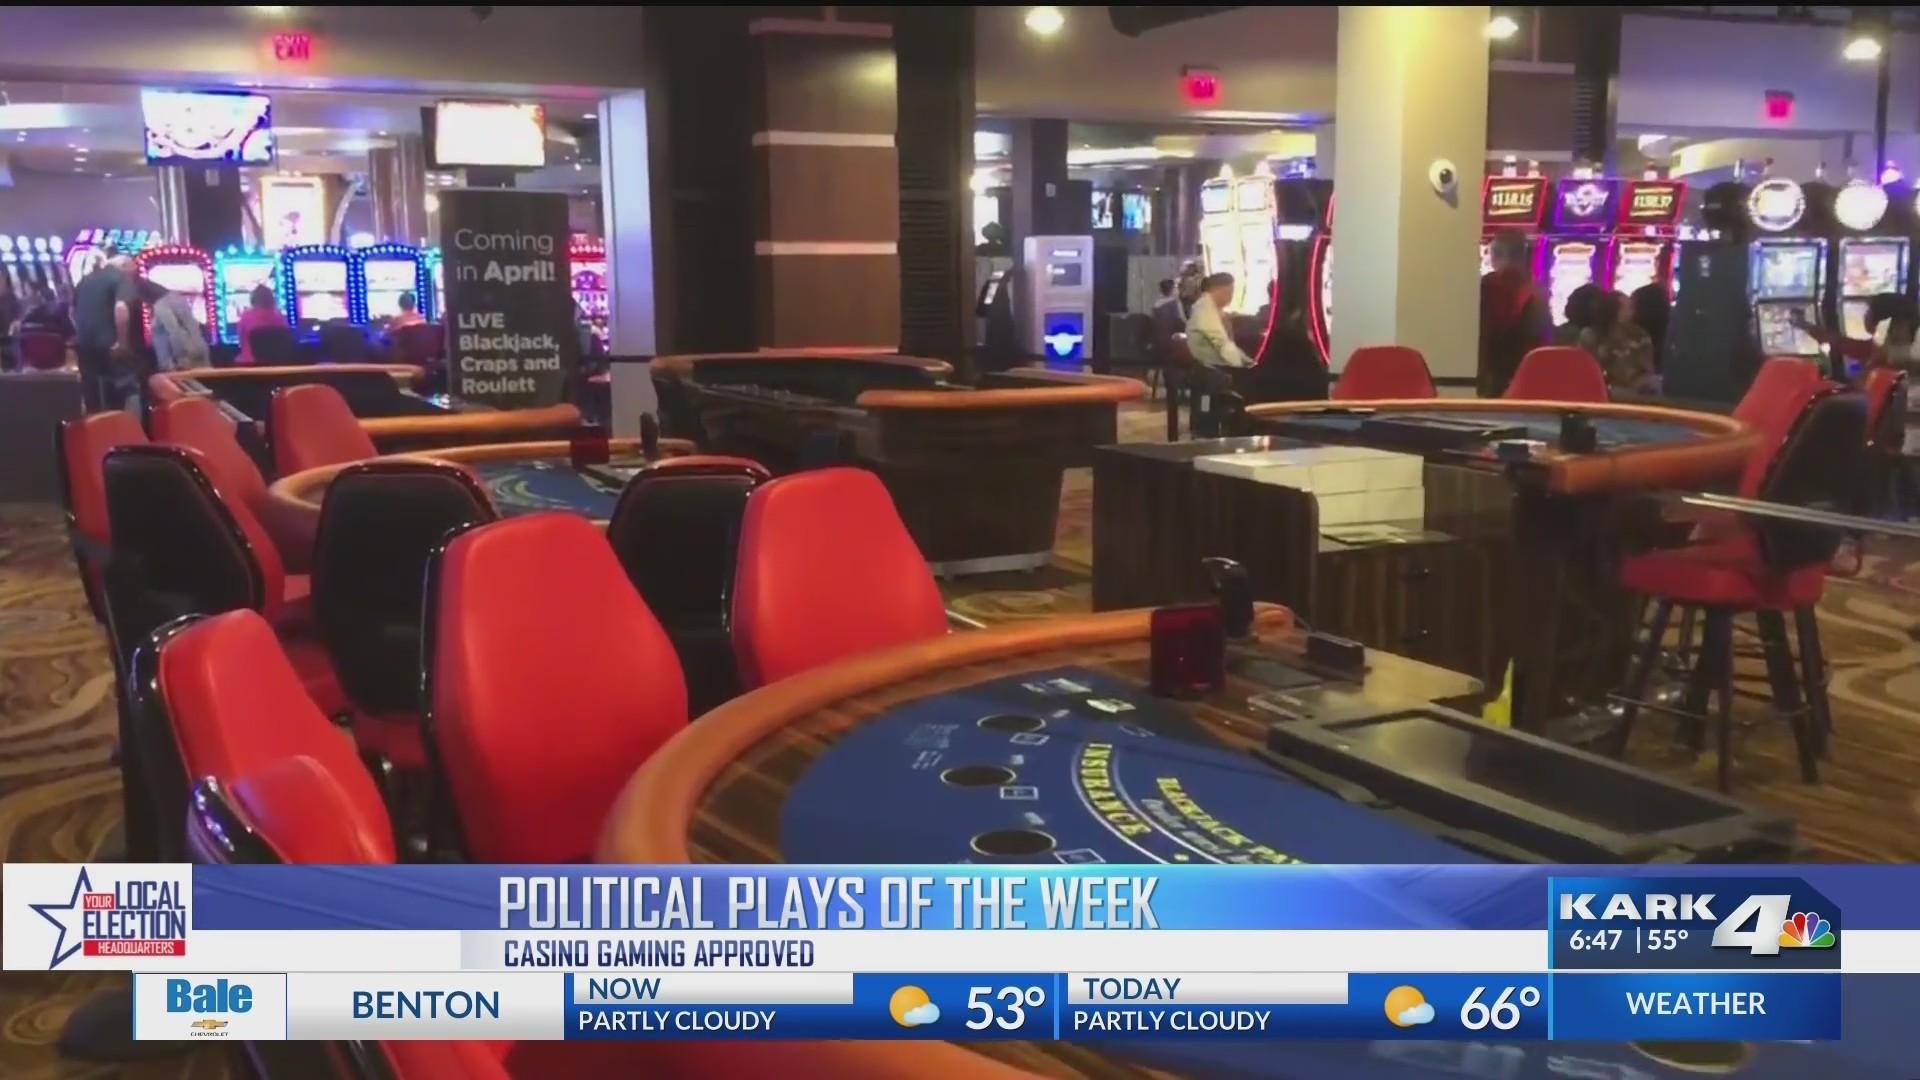 Political Plays - Mueller Report & Casino Gaming